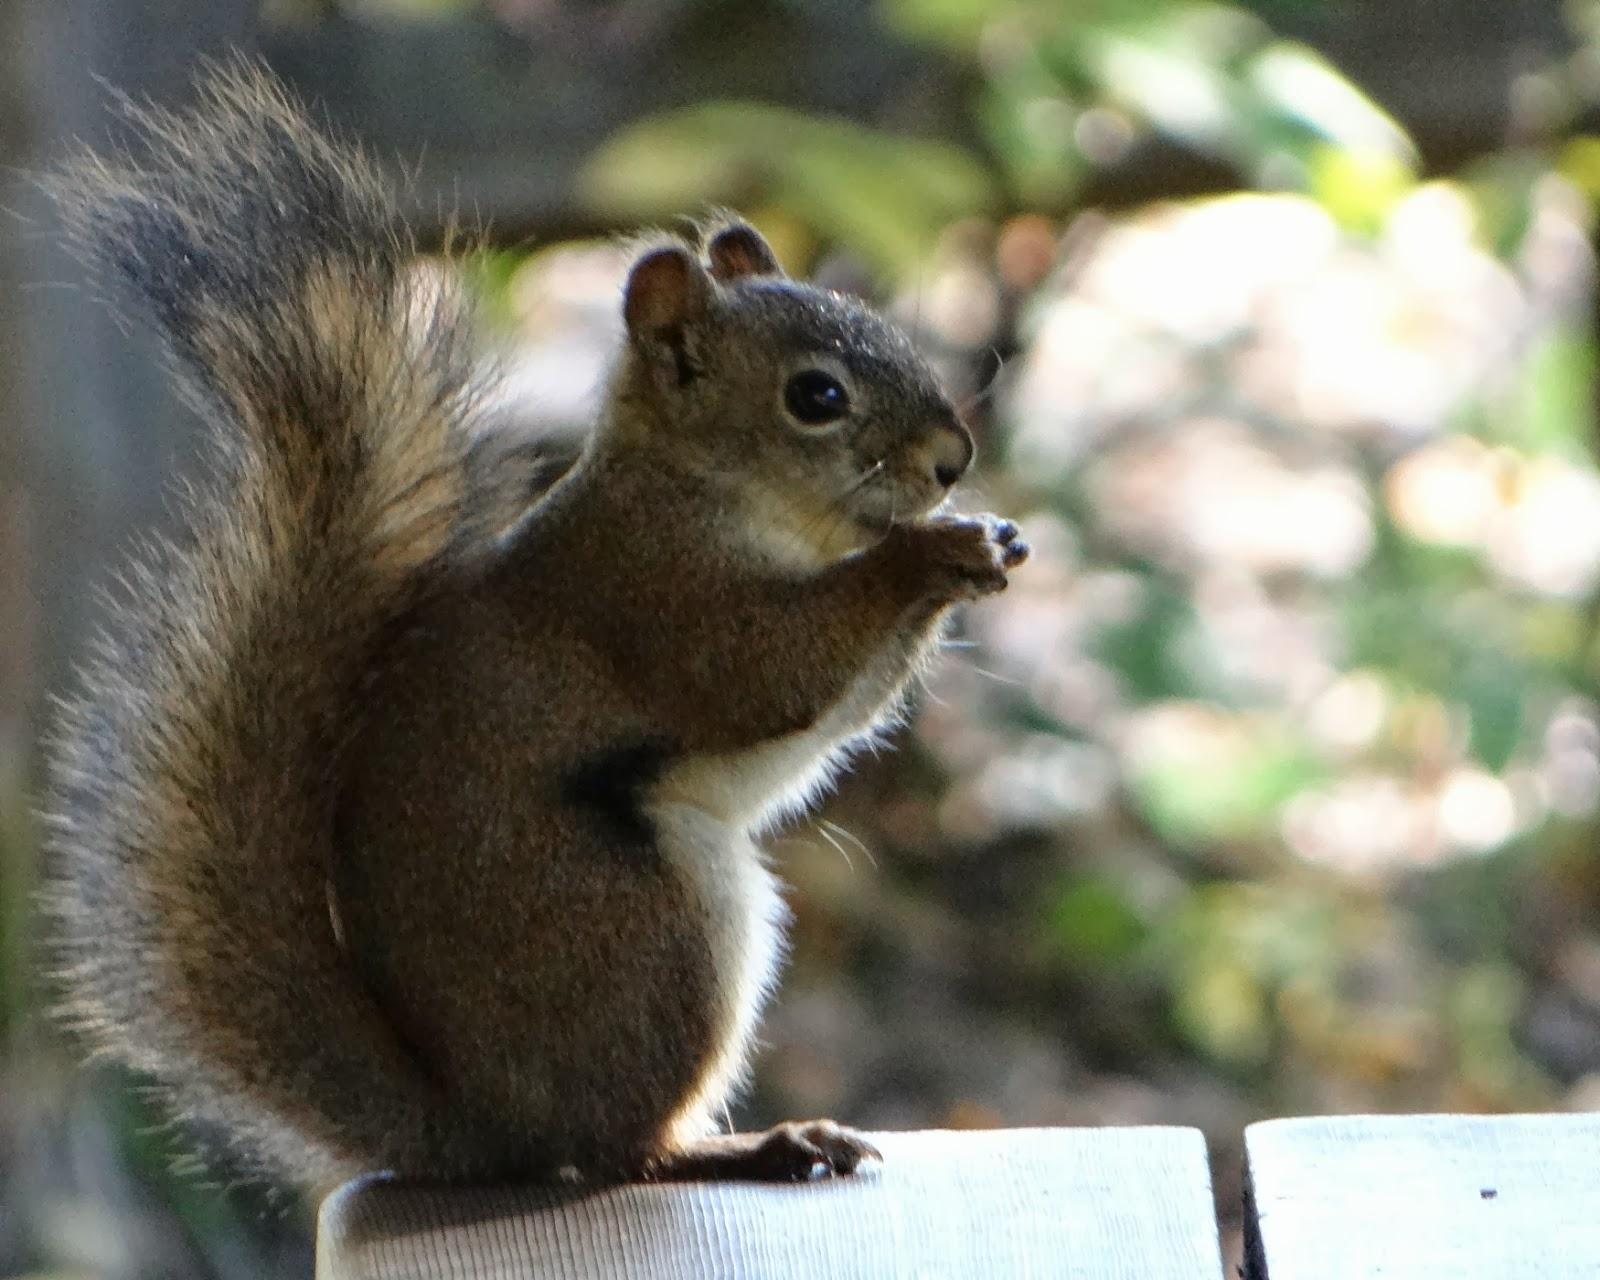 Laughing Squirrel - photo#7